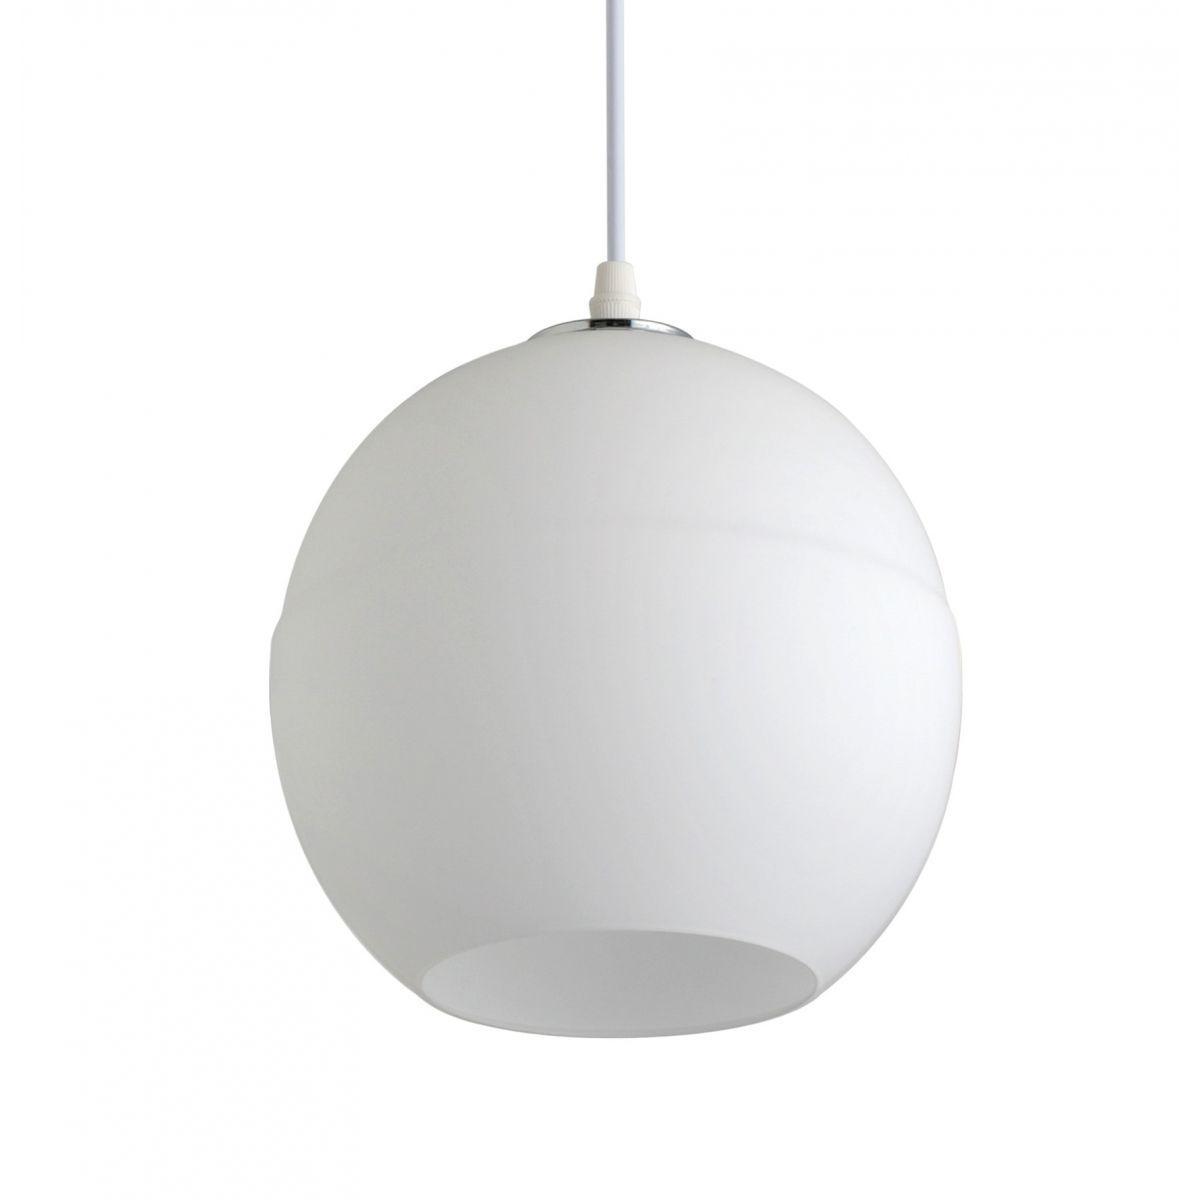 Luminária Pendente Vidro Branco Fosco Ref: Lt-222-C - Luxtek